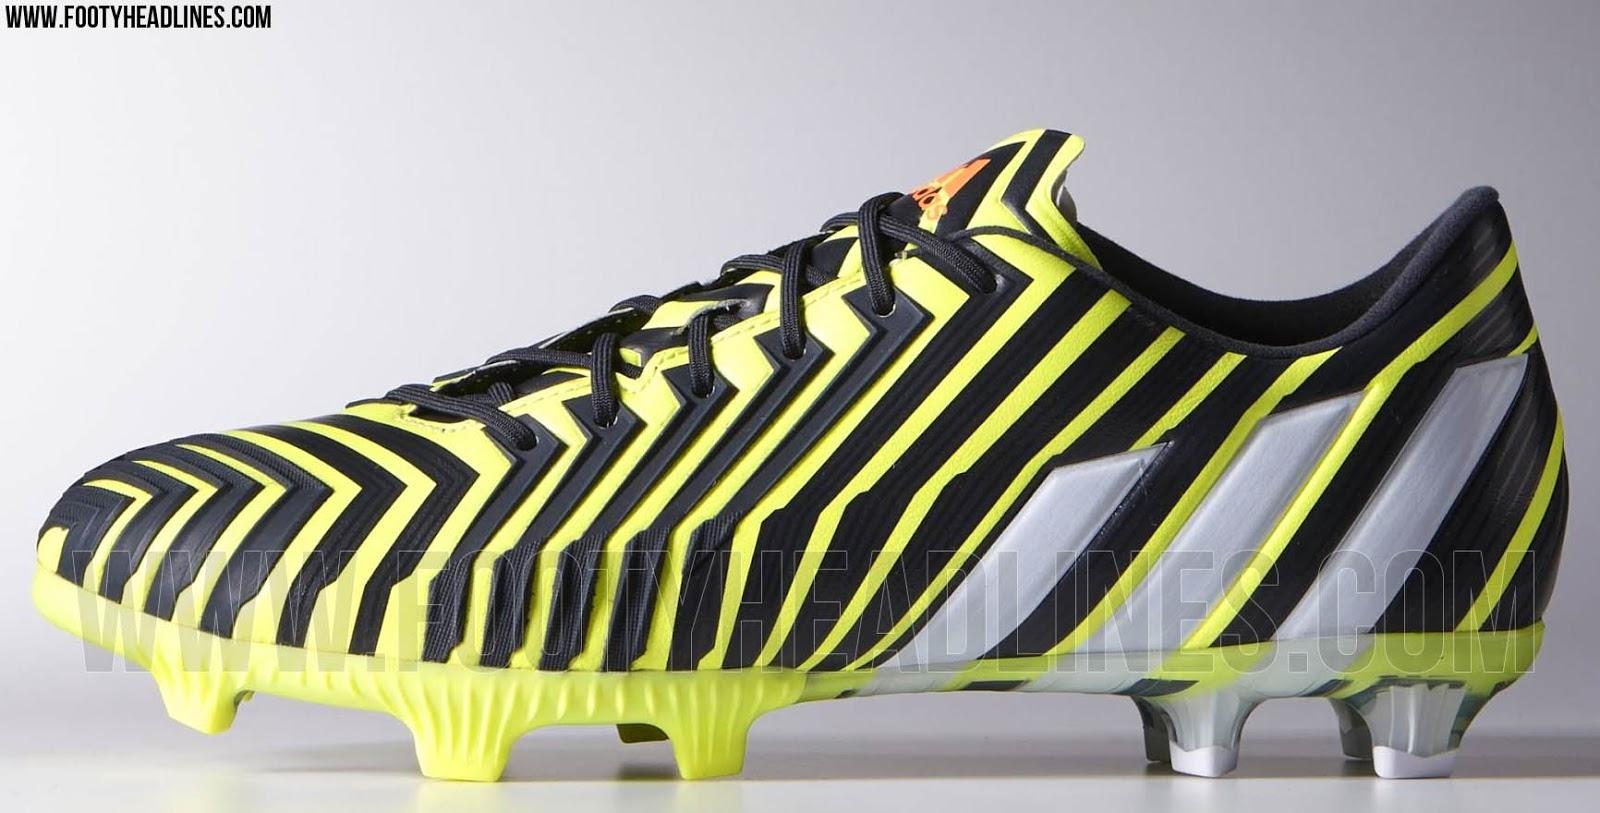 1753cdc7fae ... denmark adidas predator instinct light flash yellow black white bc204  9a1a5